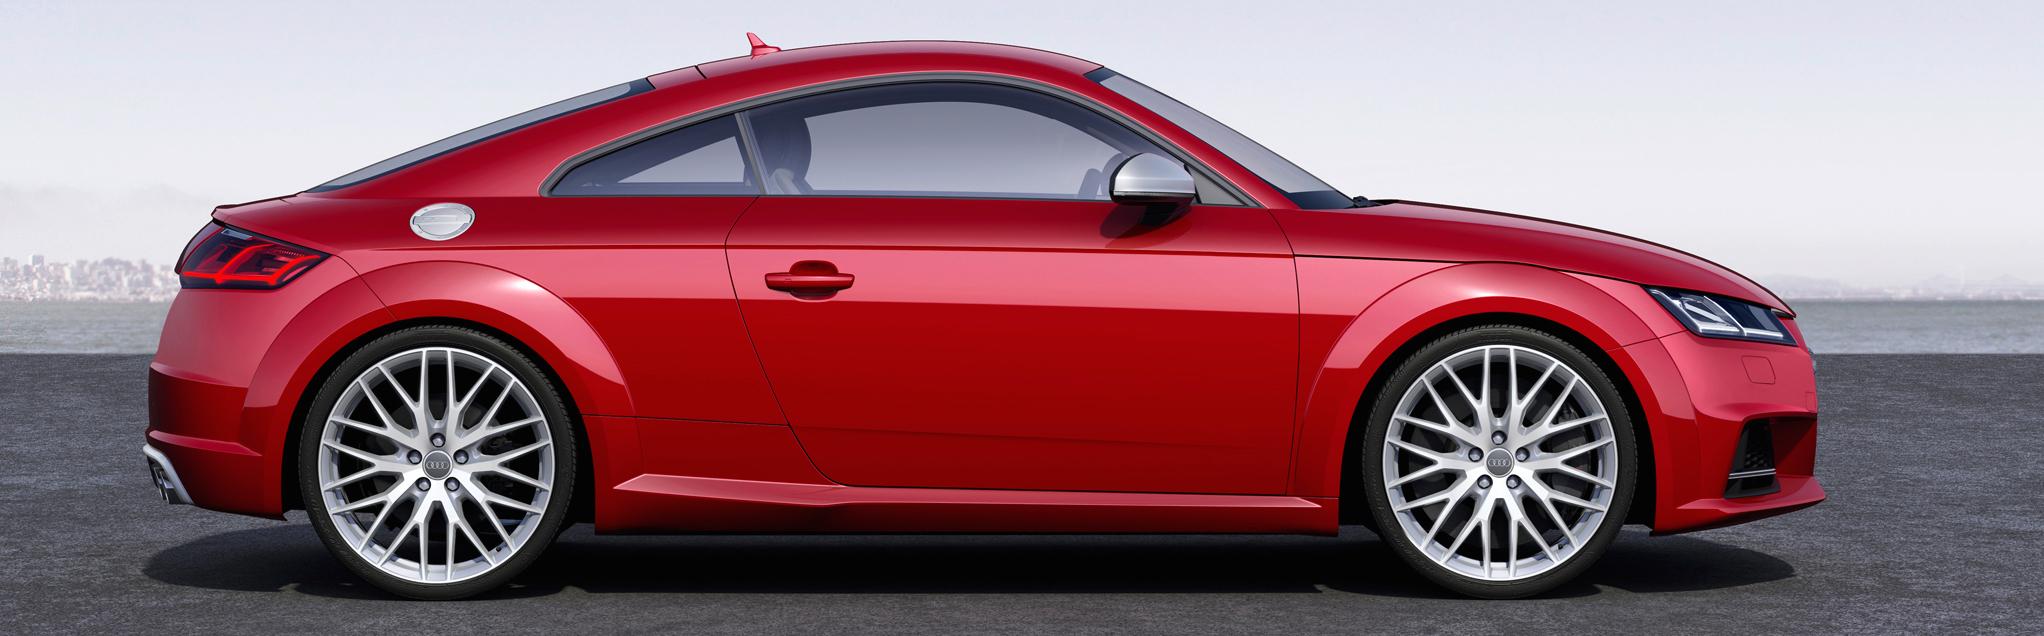 2016 Audi TT Exterior